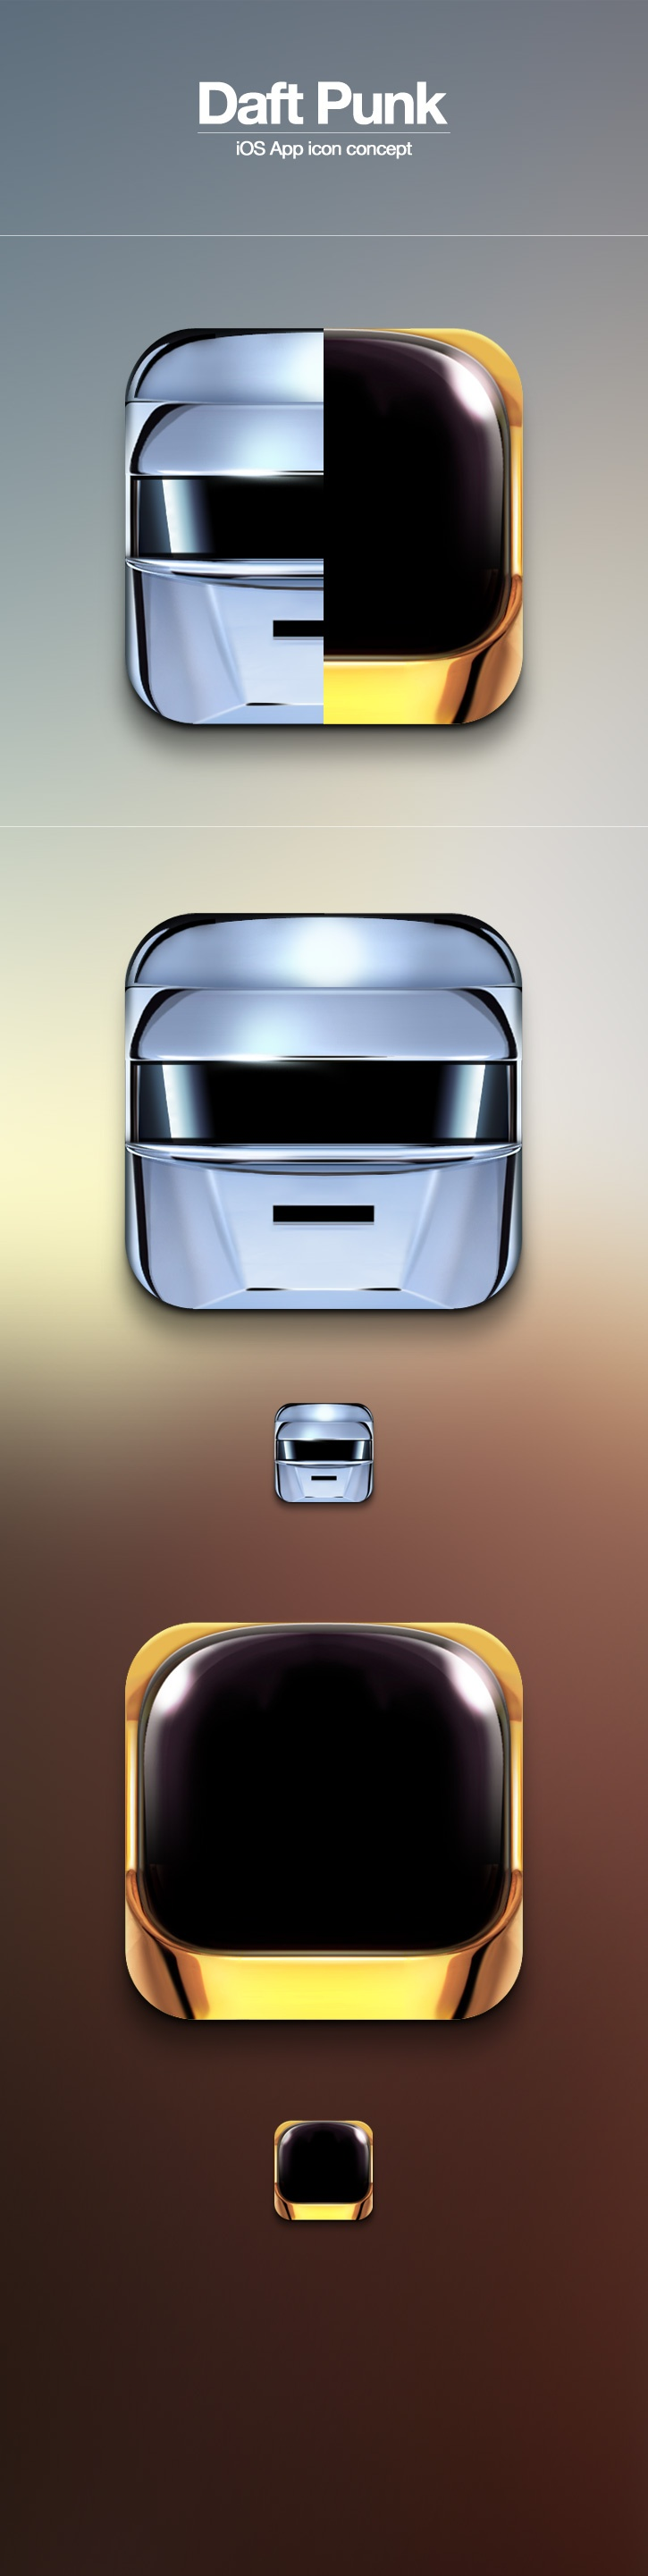 "Daft Punk ""Random Access Memories"" based App icon"